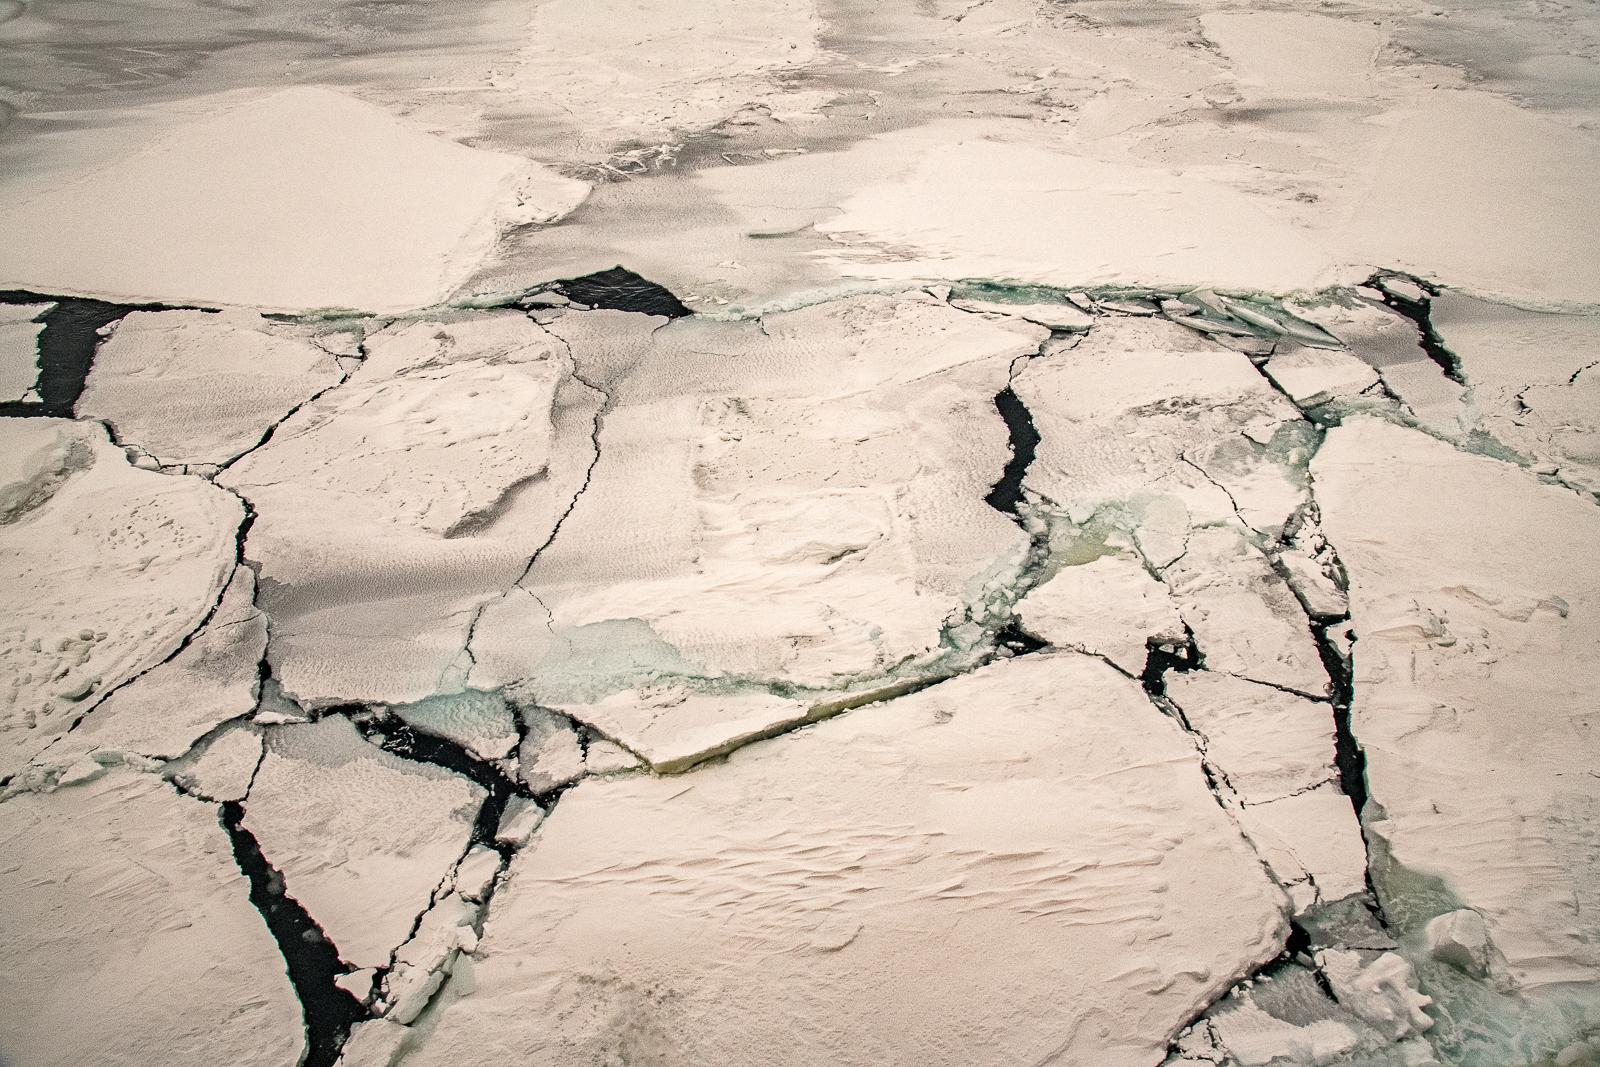 Antarctic Sea Ice Abstraction, Thinning Seasonal Ice